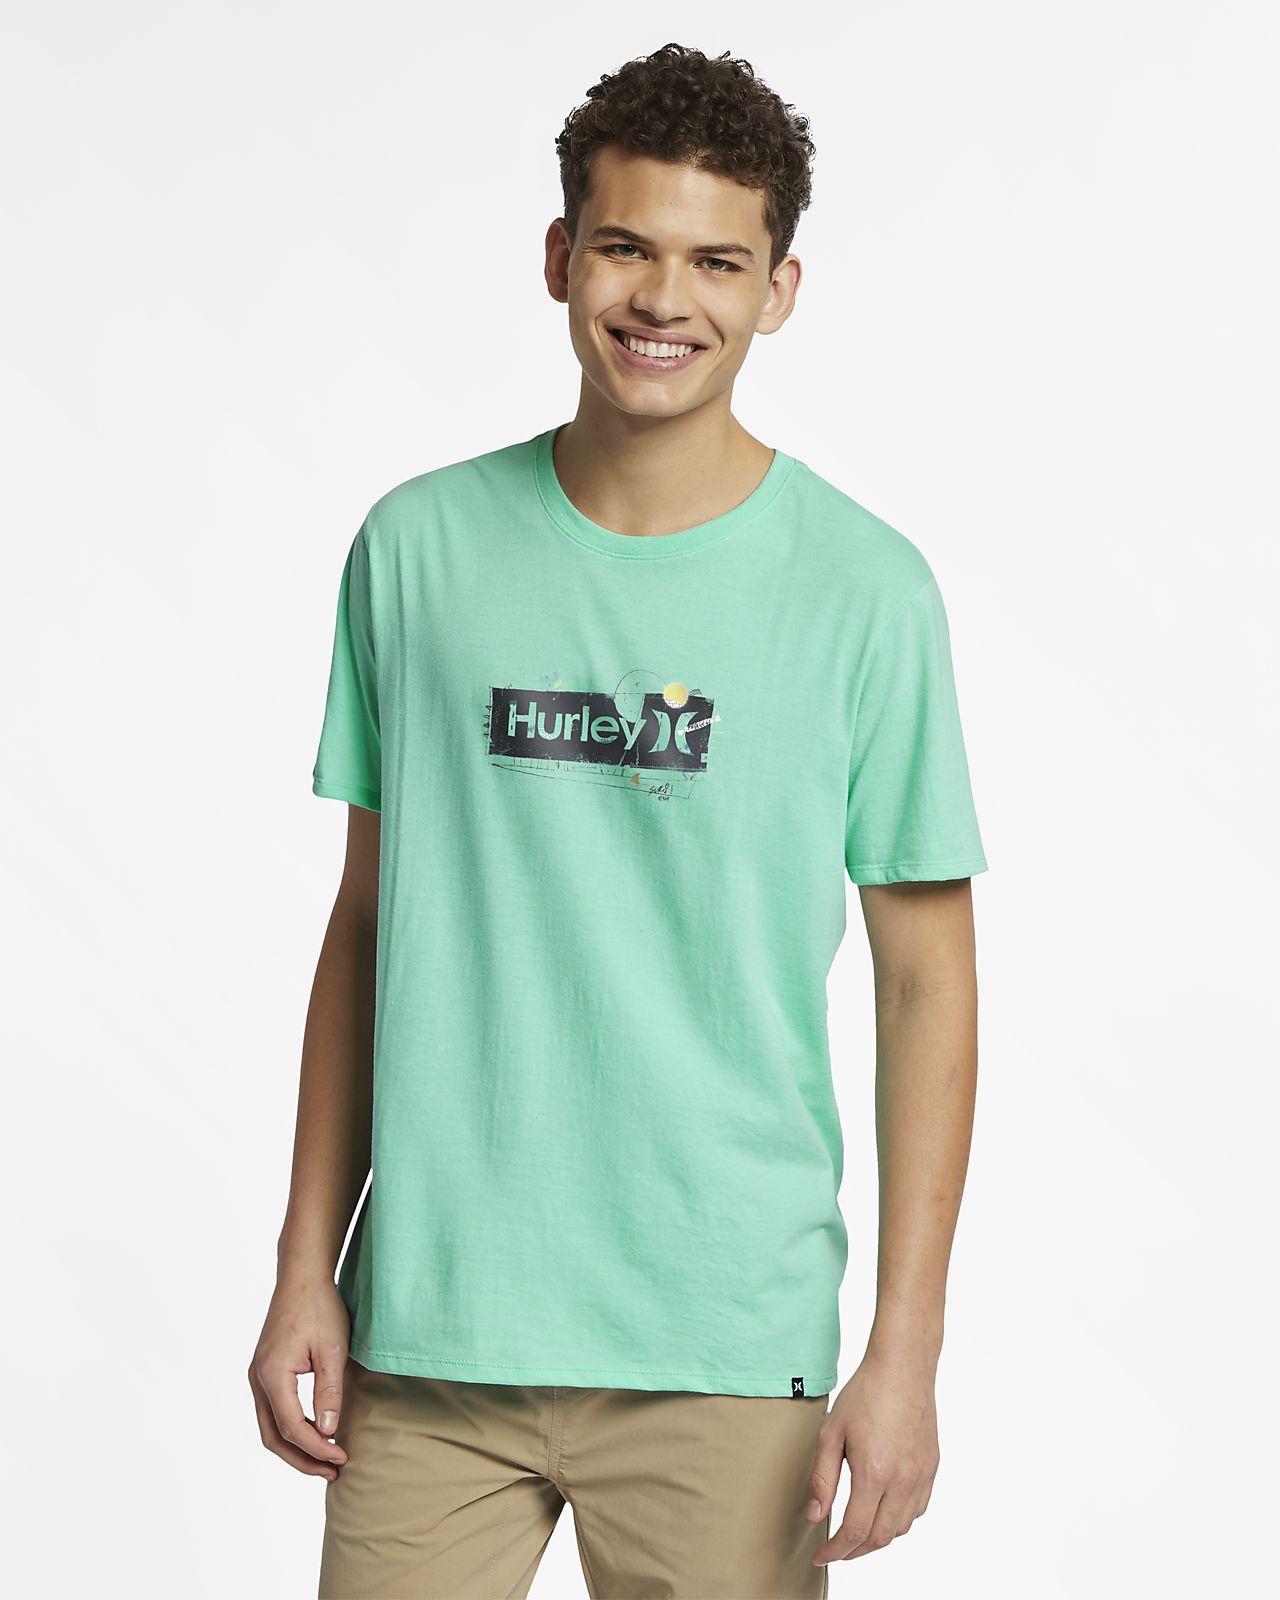 T-shirt Hurley Premium One And Only Punked för män